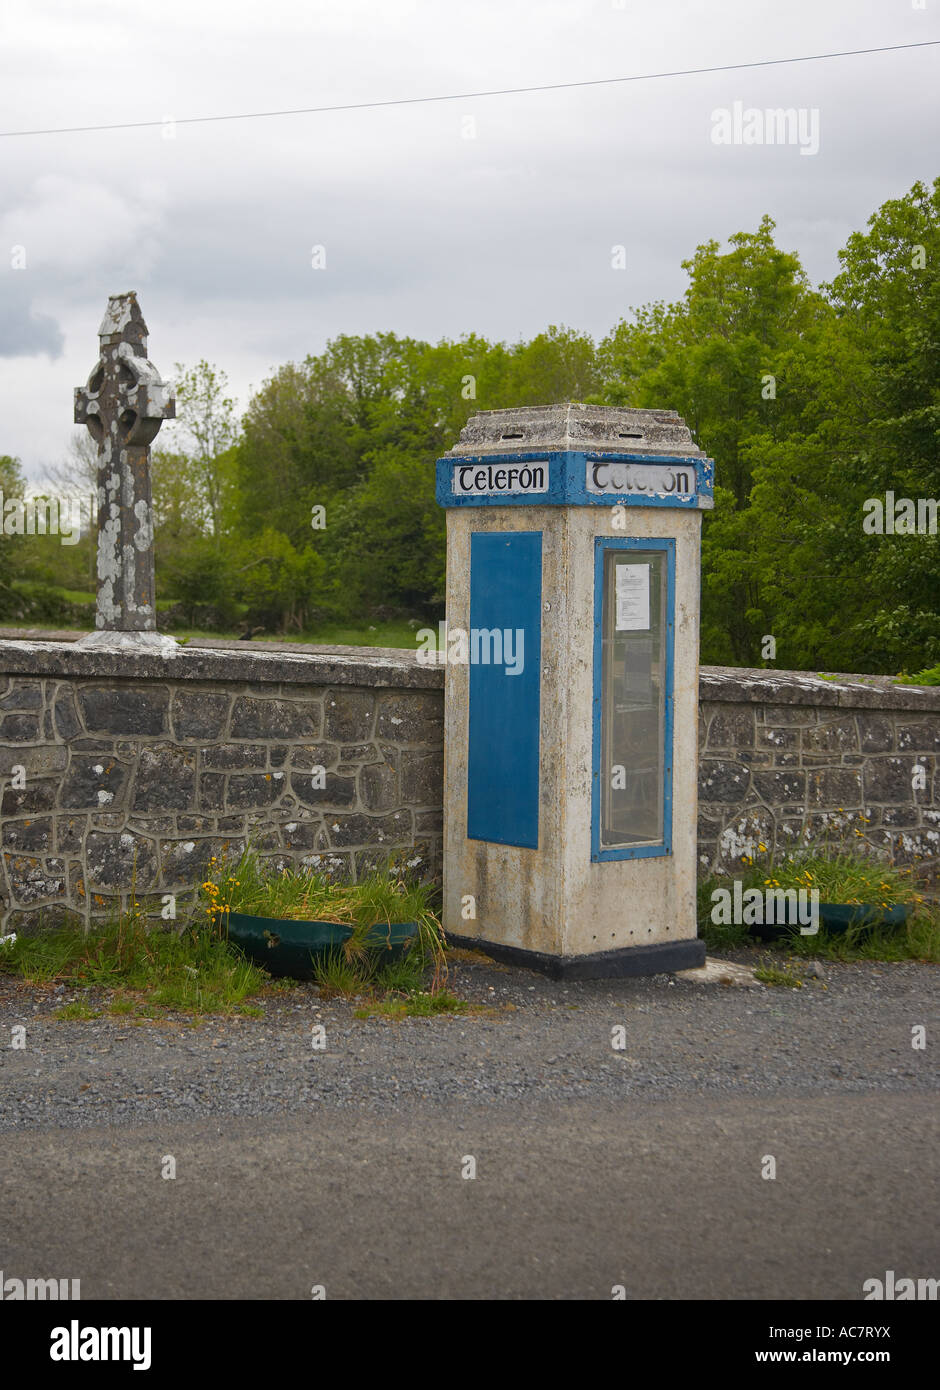 Irish Telephone Kiosk, Telefon, near Galway, Ireland - Stock Image